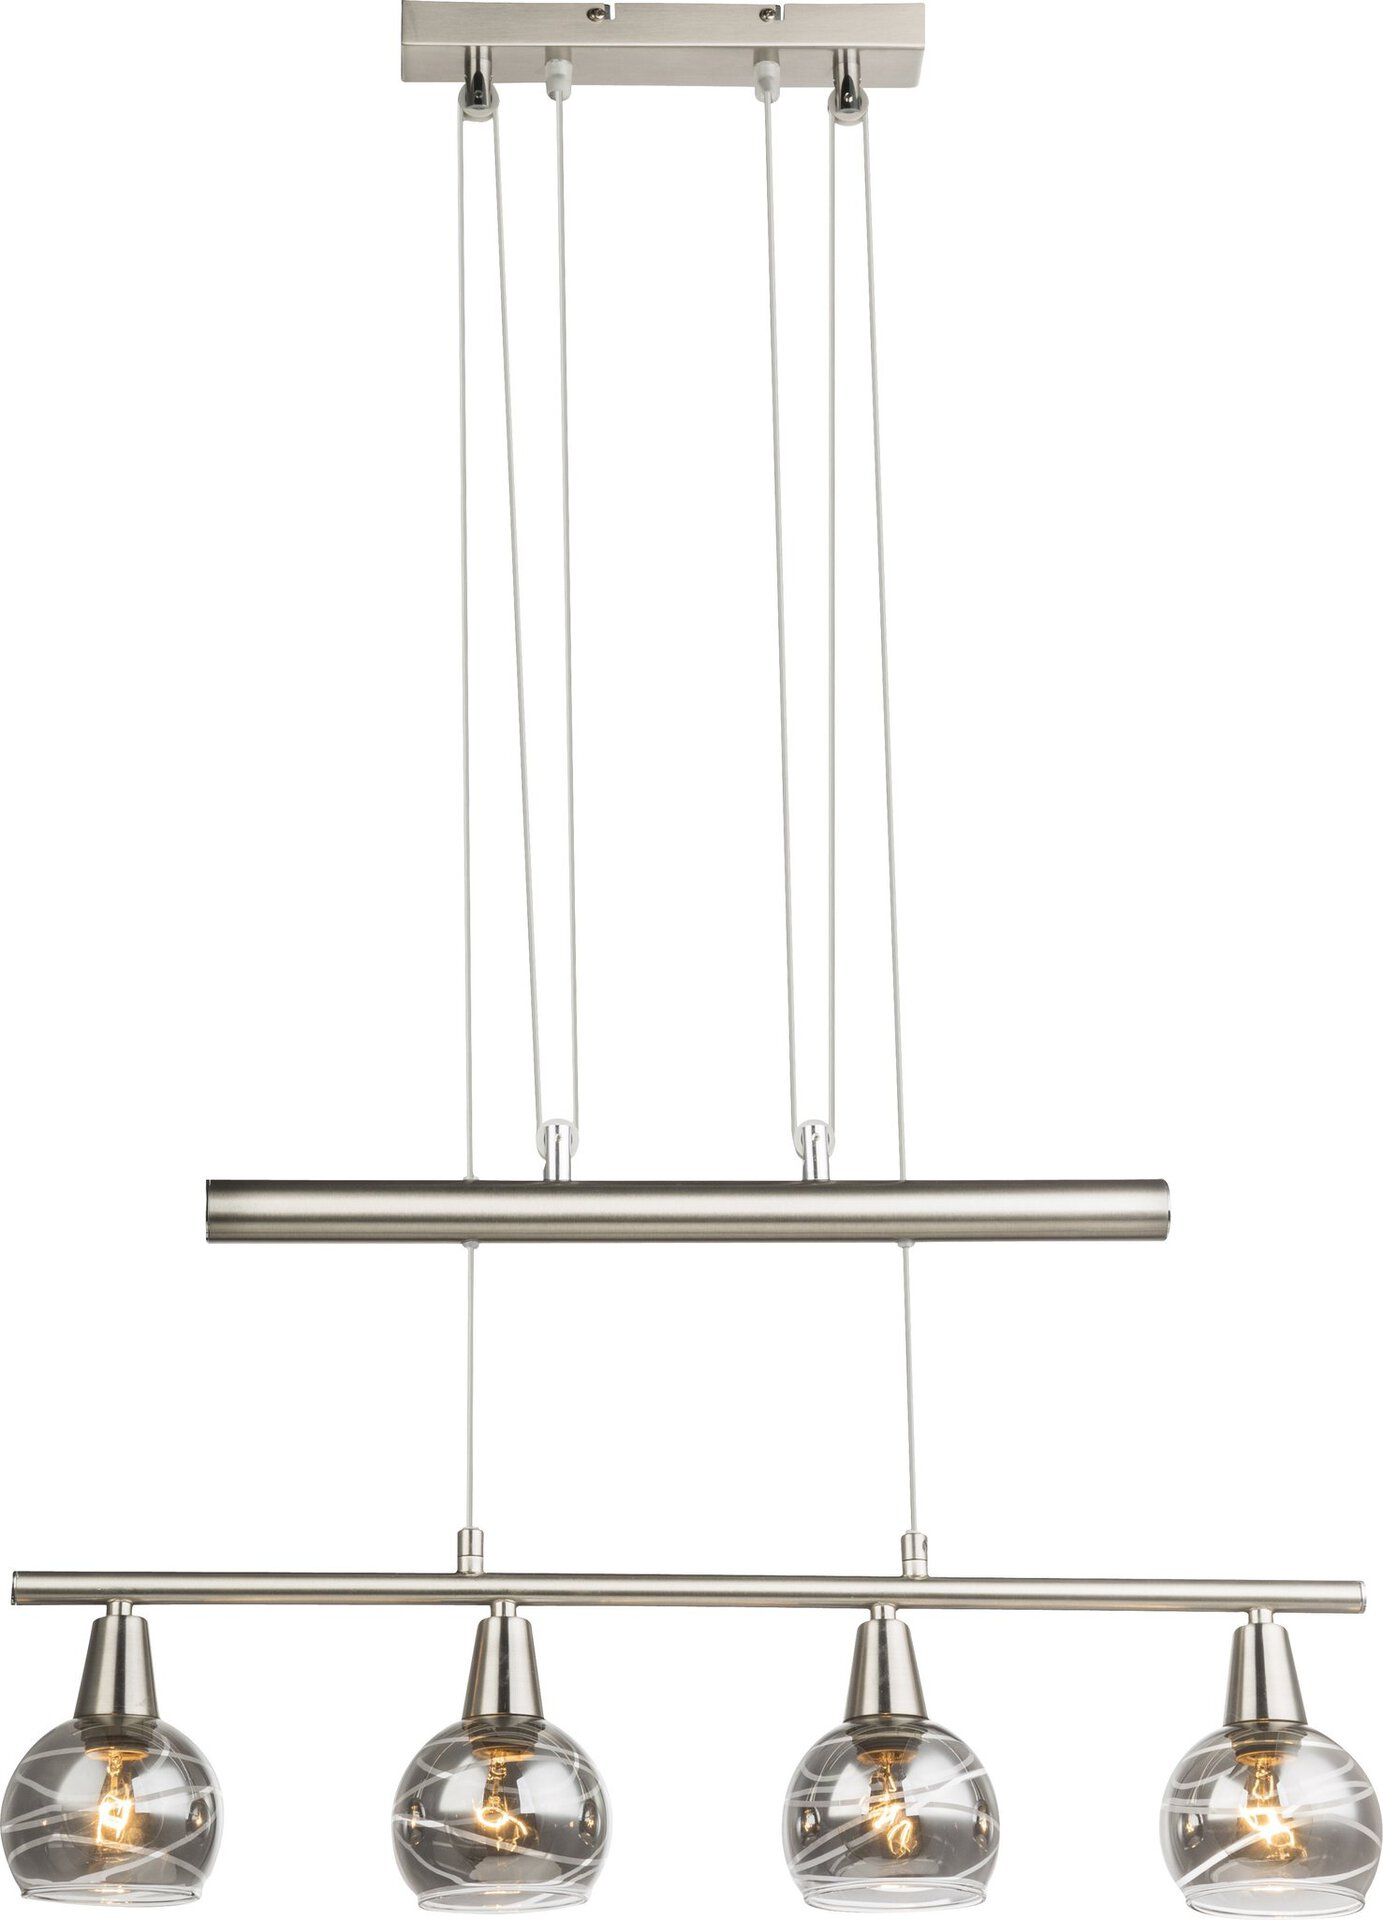 Hängeleuchte ROMAN Globo Metall silber 10 x 160 x 60 cm